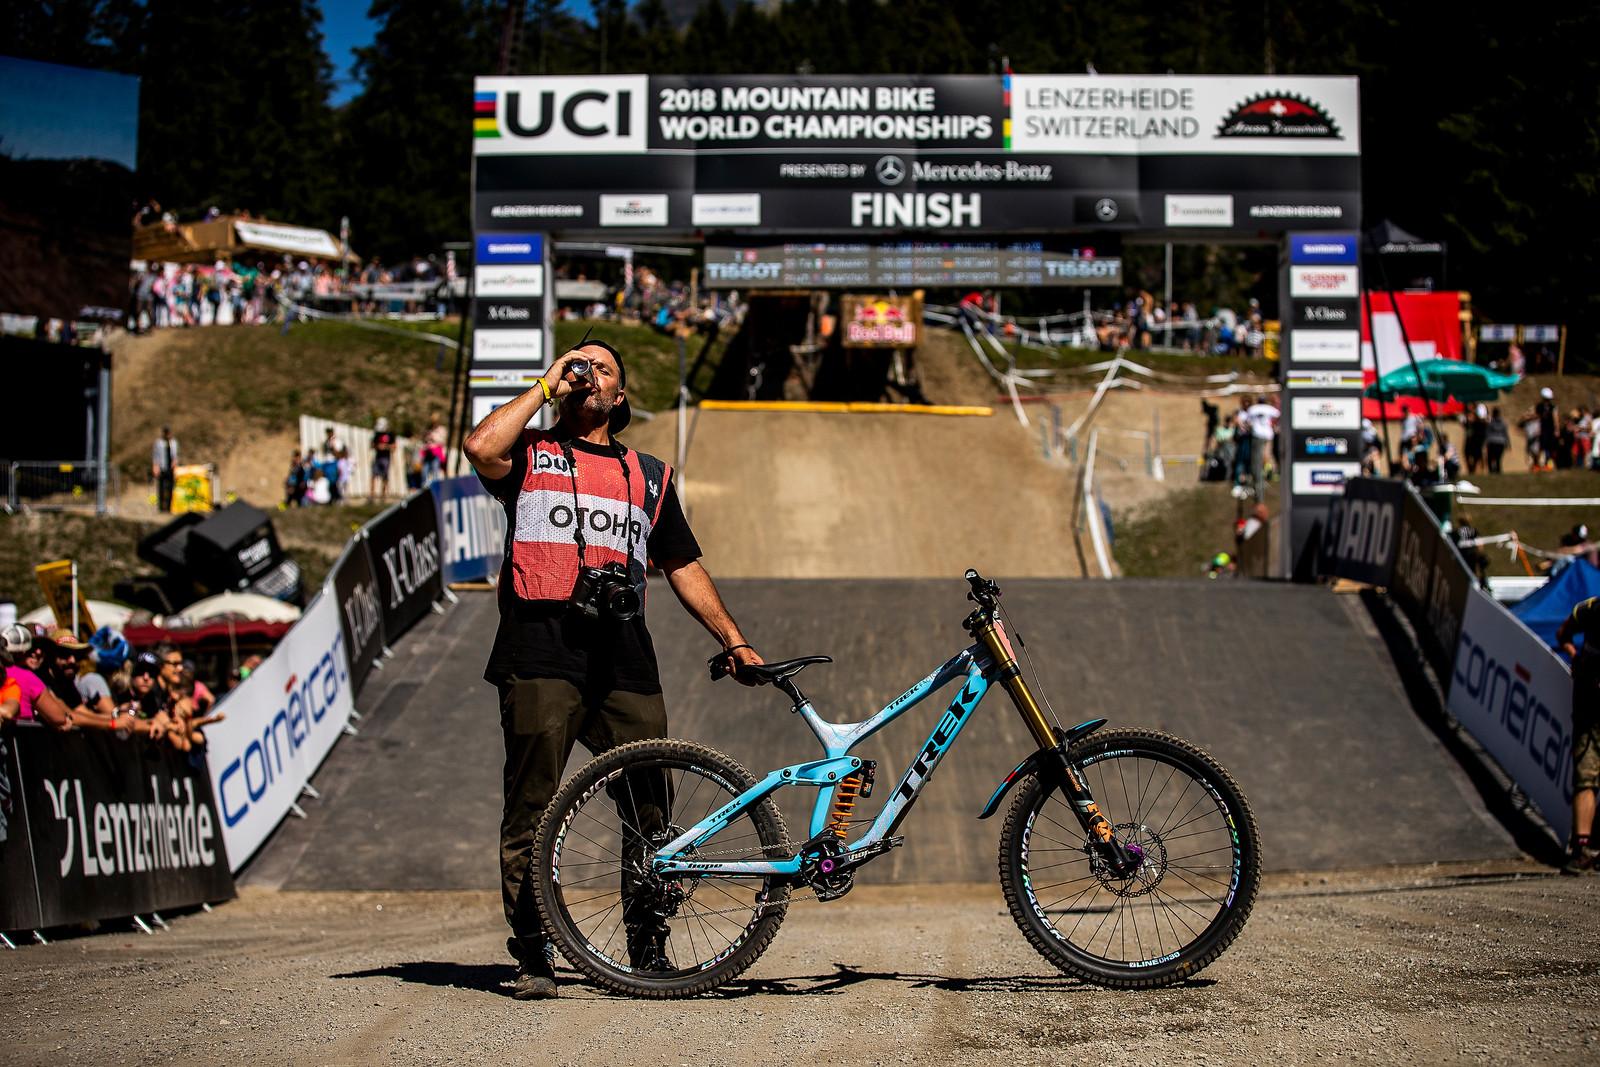 Sven Wishes It Was His - WINNING BIKE - Rachel Atherton's Trek Session - Mountain Biking Pictures - Vital MTB